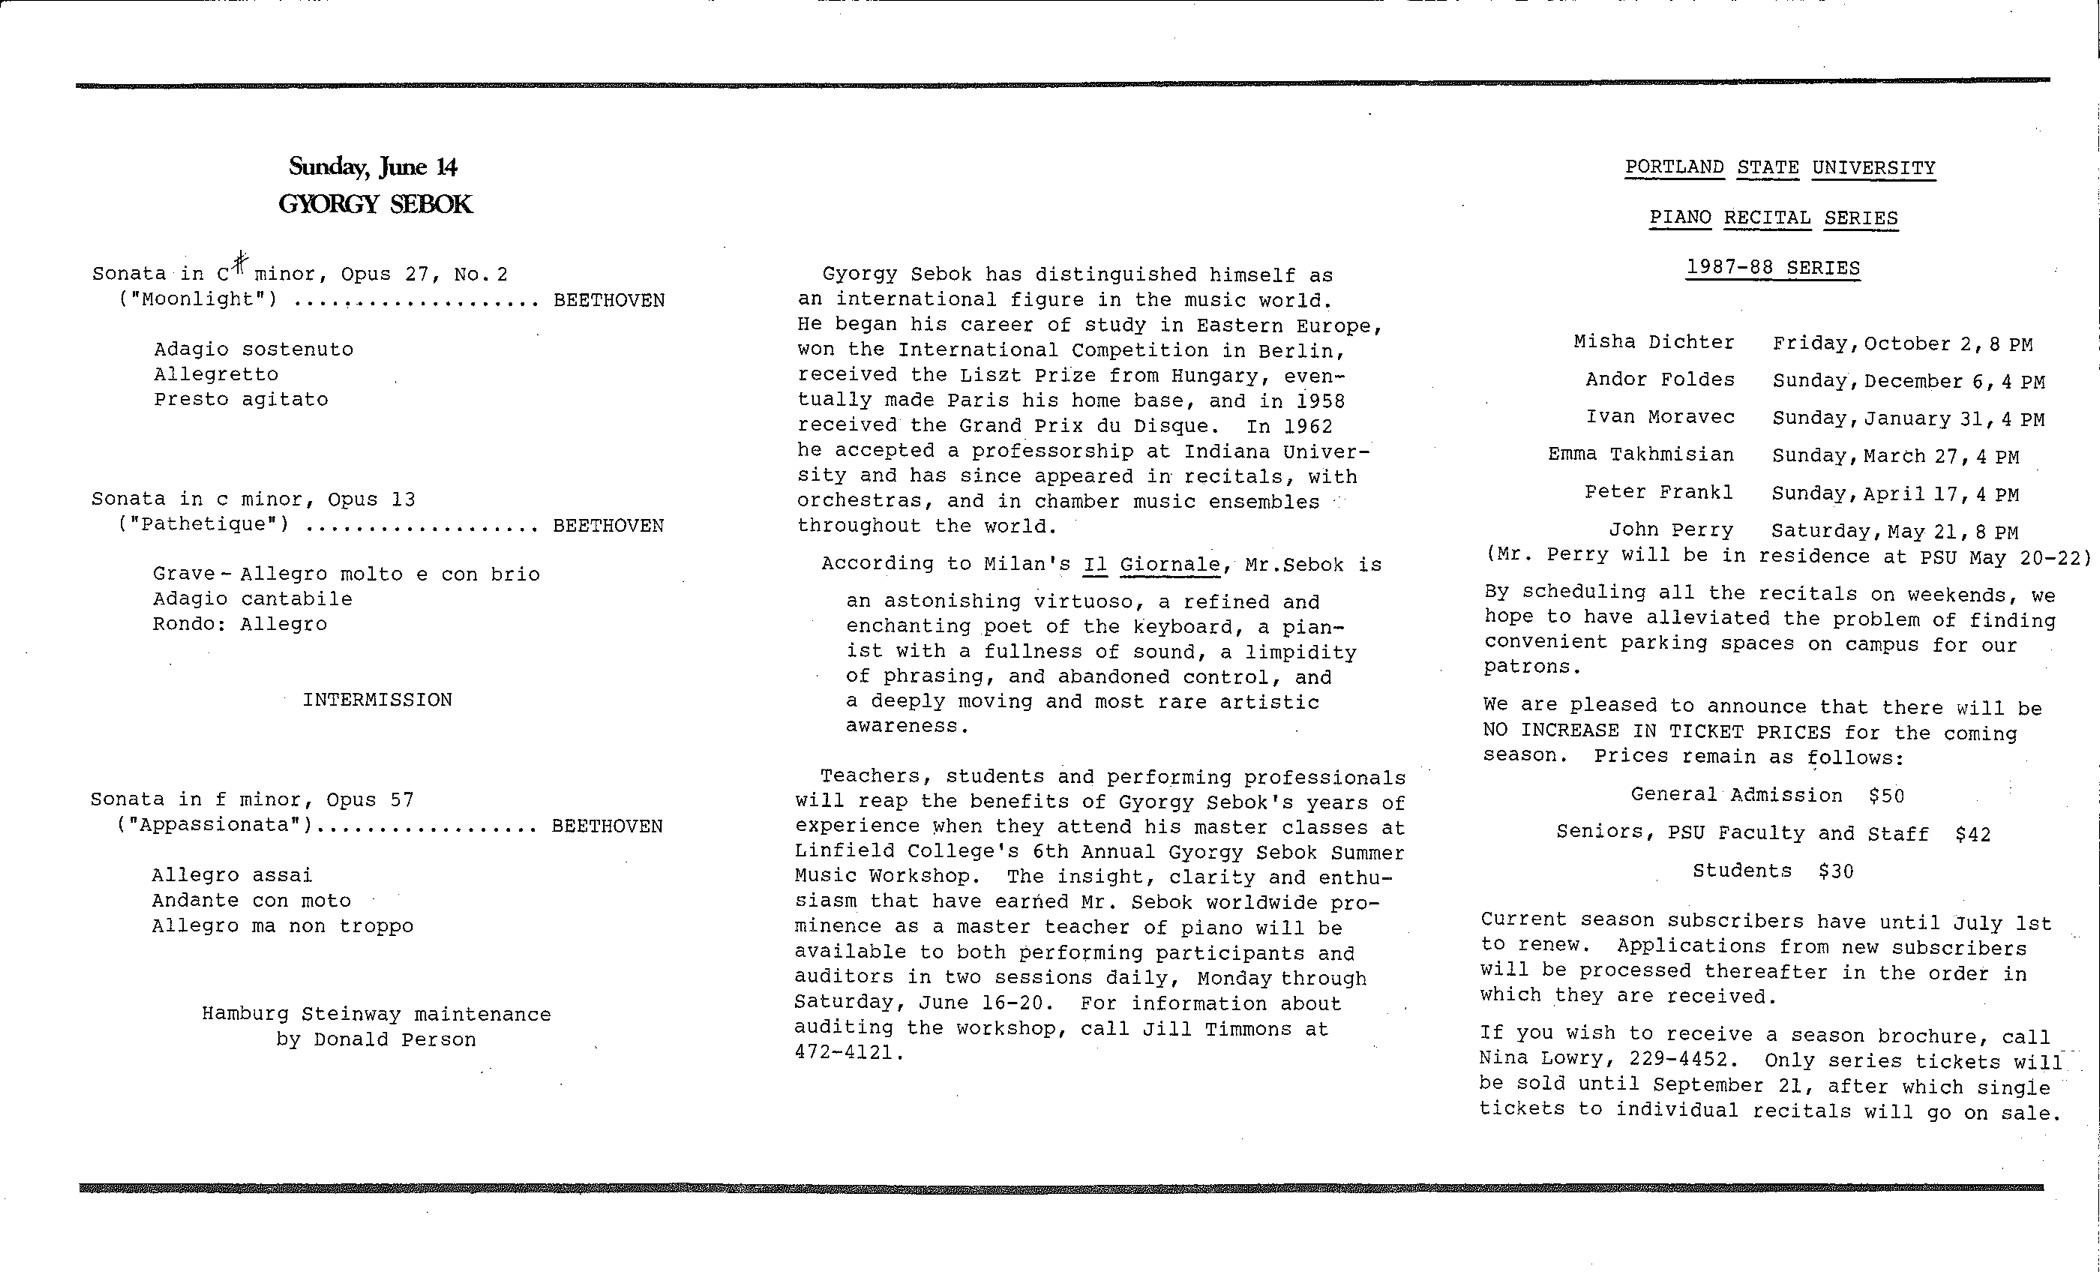 Sebok86-87_Program1.jpg